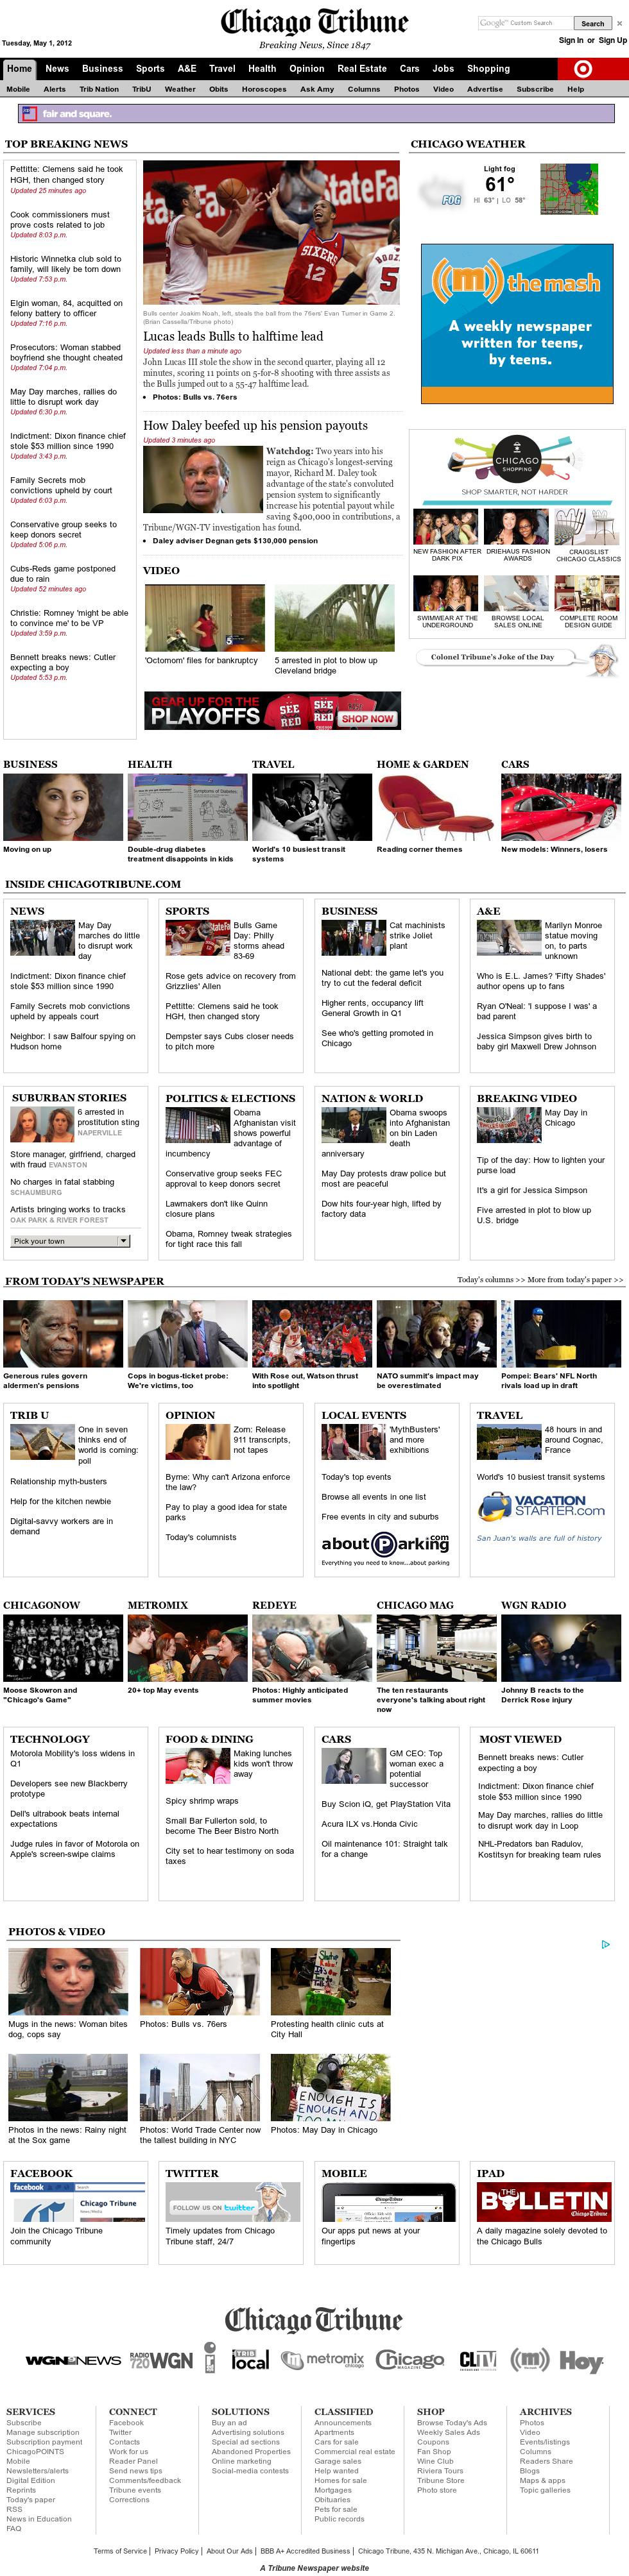 Chicago Tribune at Wednesday May 2, 2012, 2:03 a.m. UTC